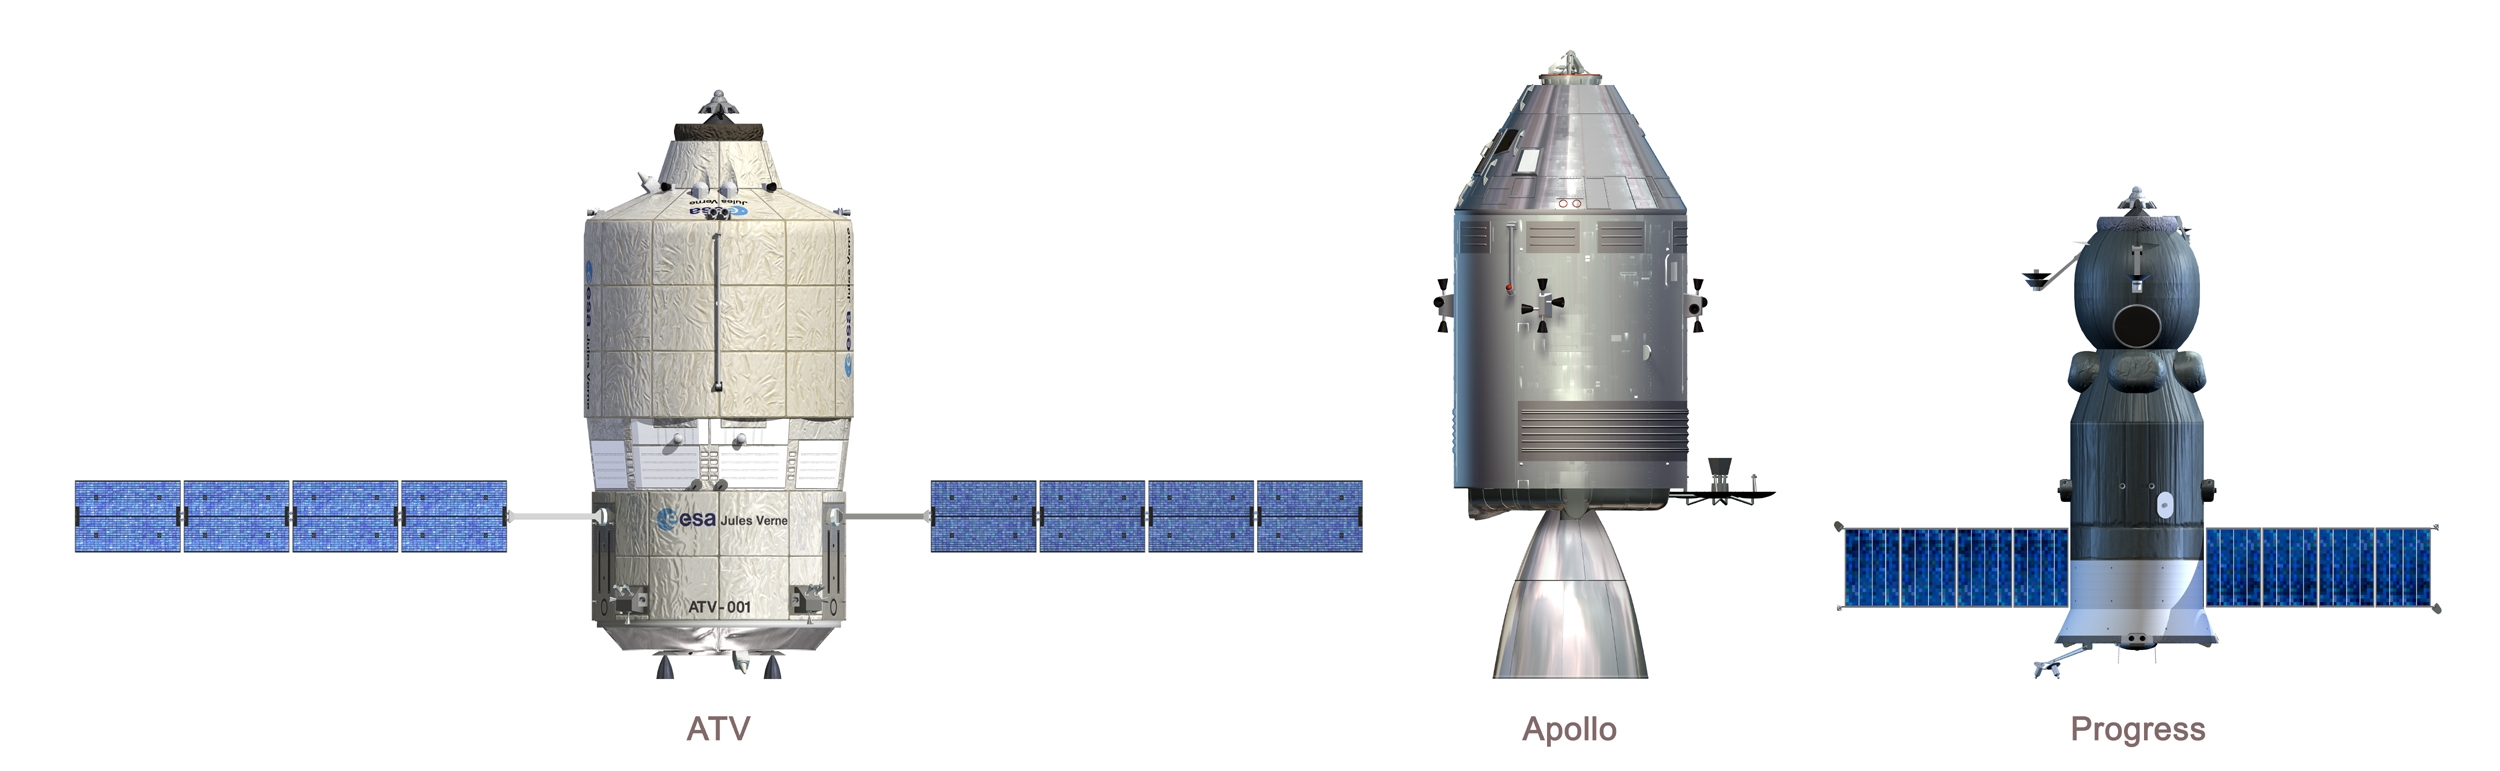 spacecraft uses - photo #25